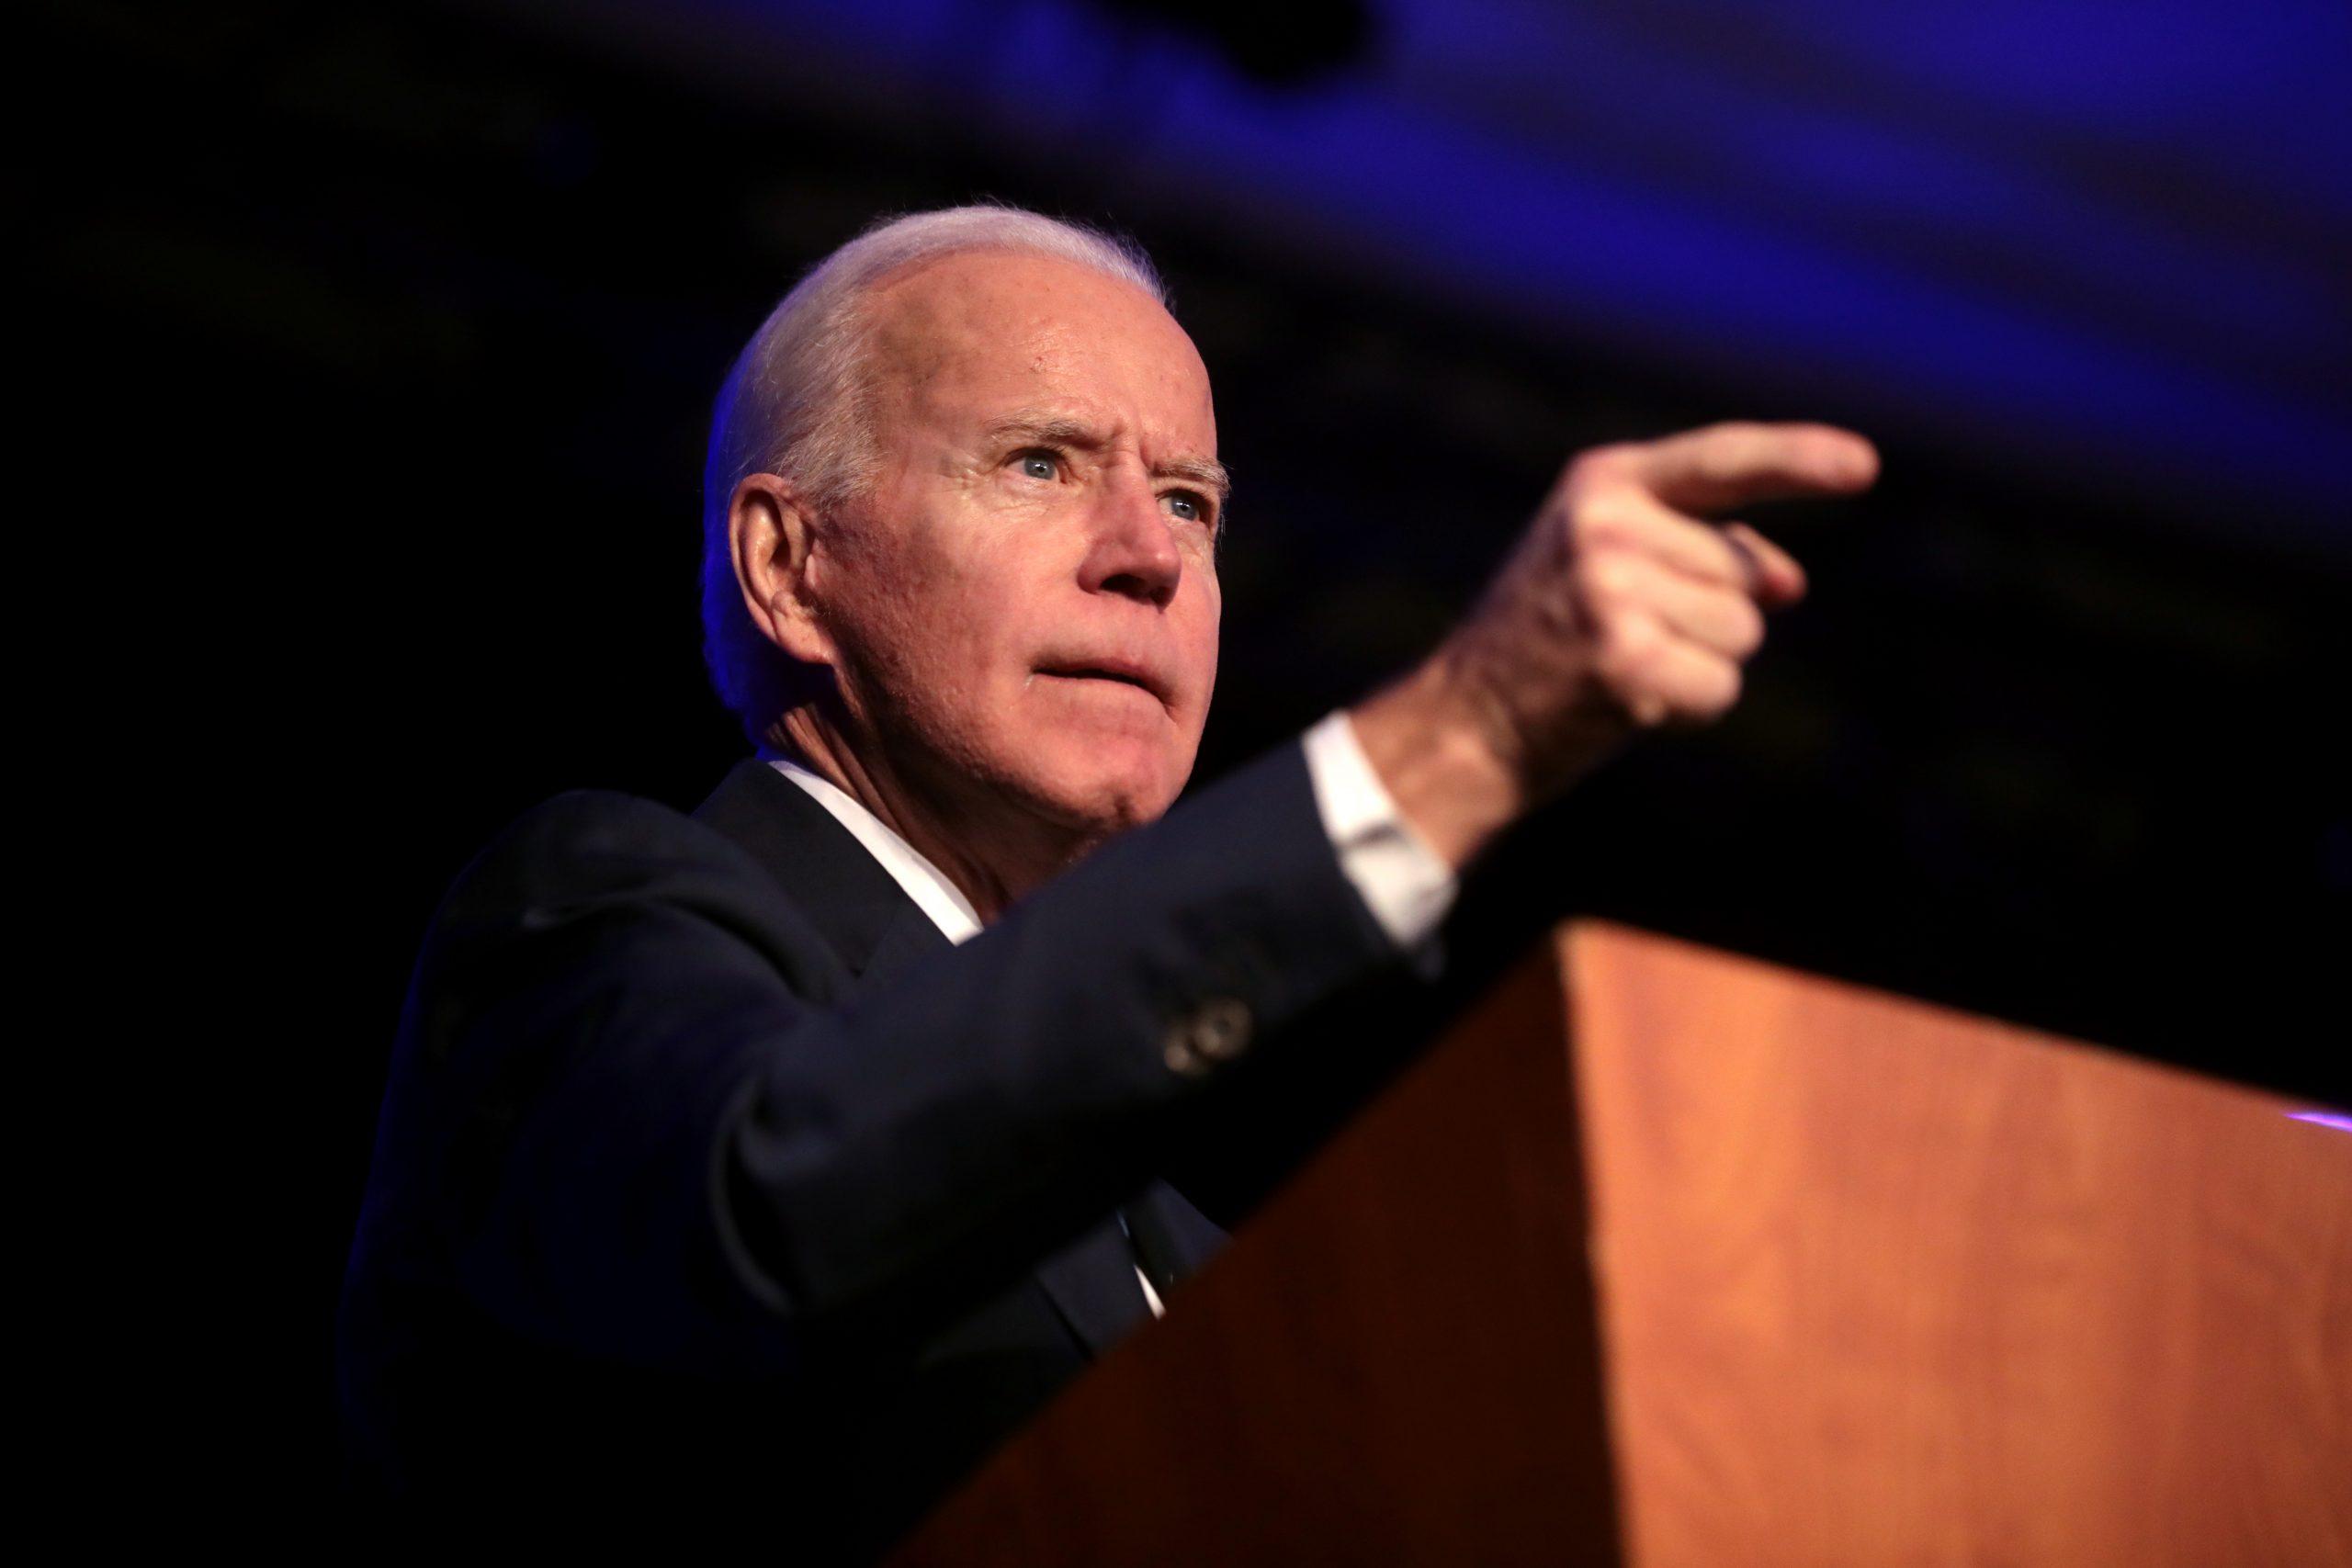 Fwd: Iowa Alert: Biden Demands Gun Control TODAY!